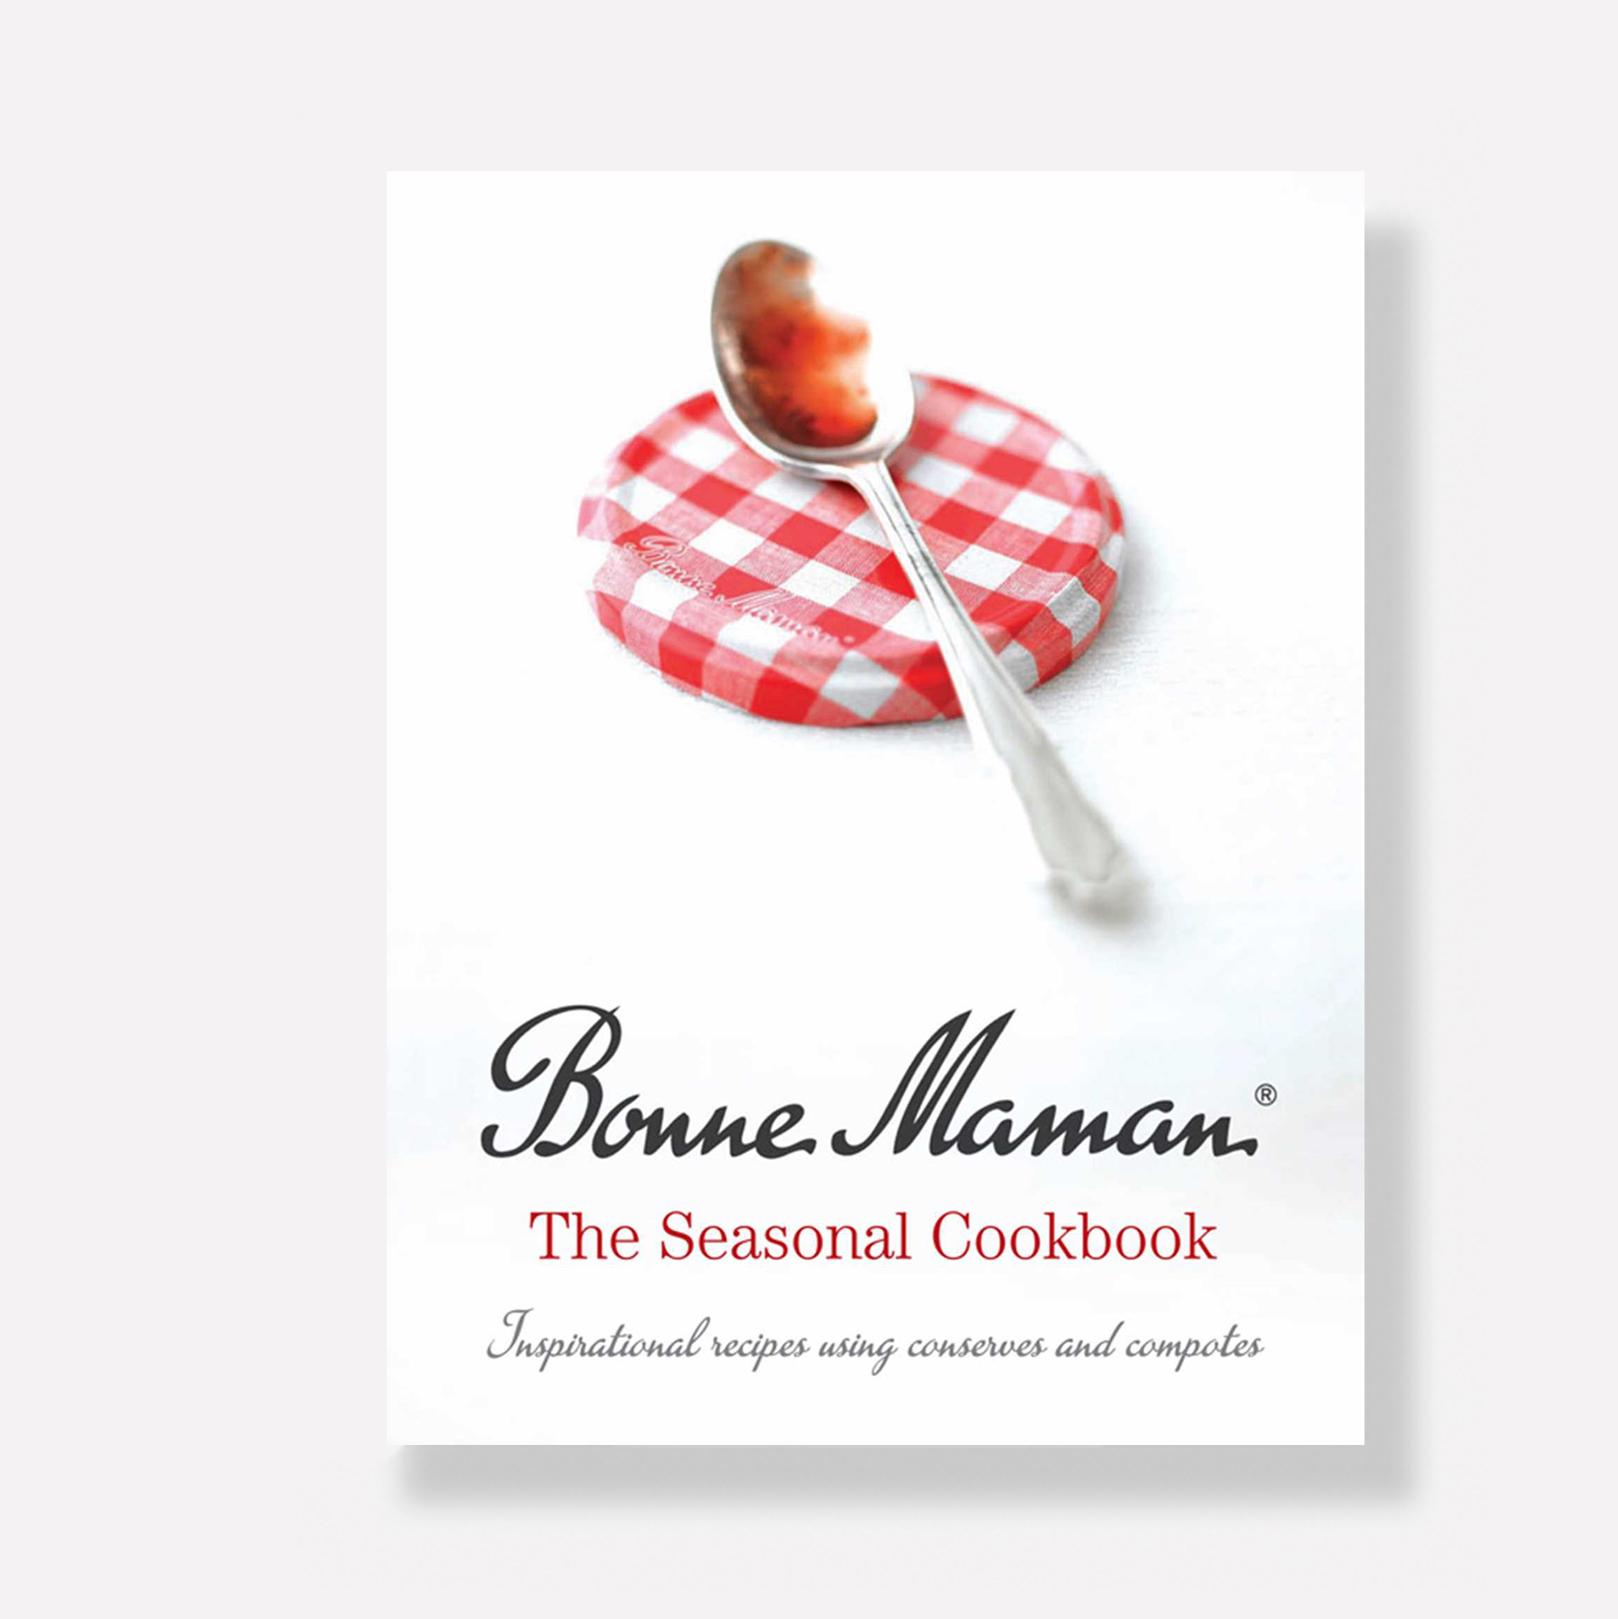 bonne-maman-the-seasonal-cookbook-WEB.jpg